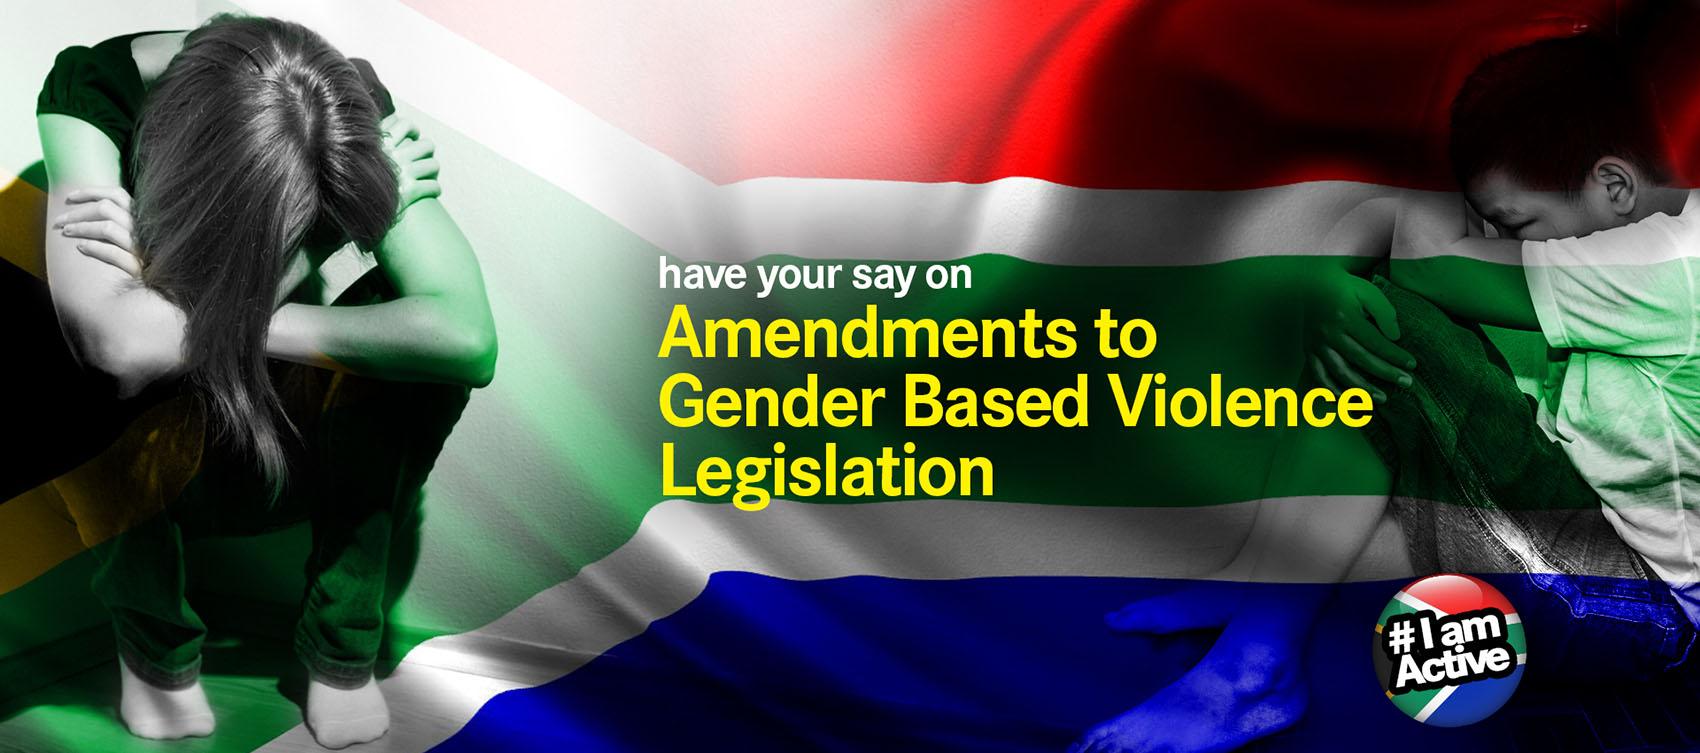 Have your say on amendments to GBV legislation DearSA GBV bills